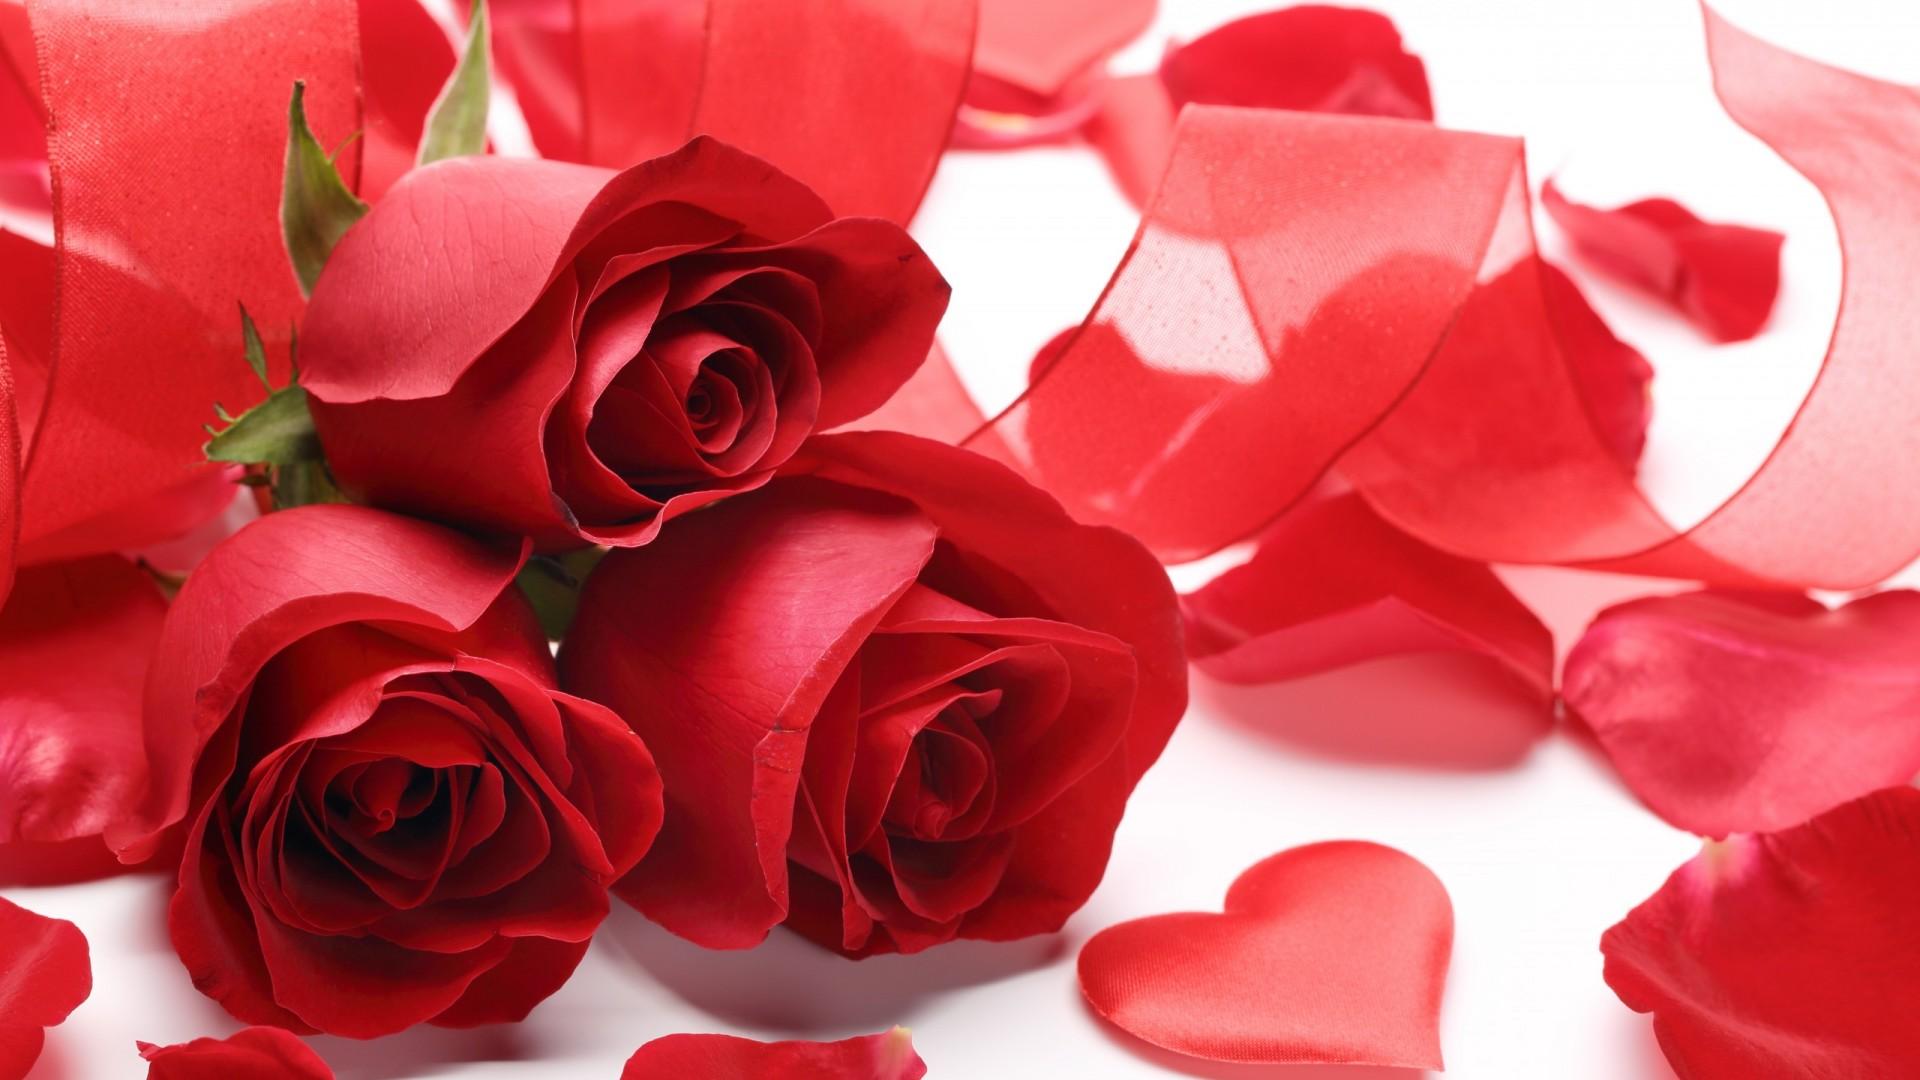 Wednesday 14th February- Valentine's Day